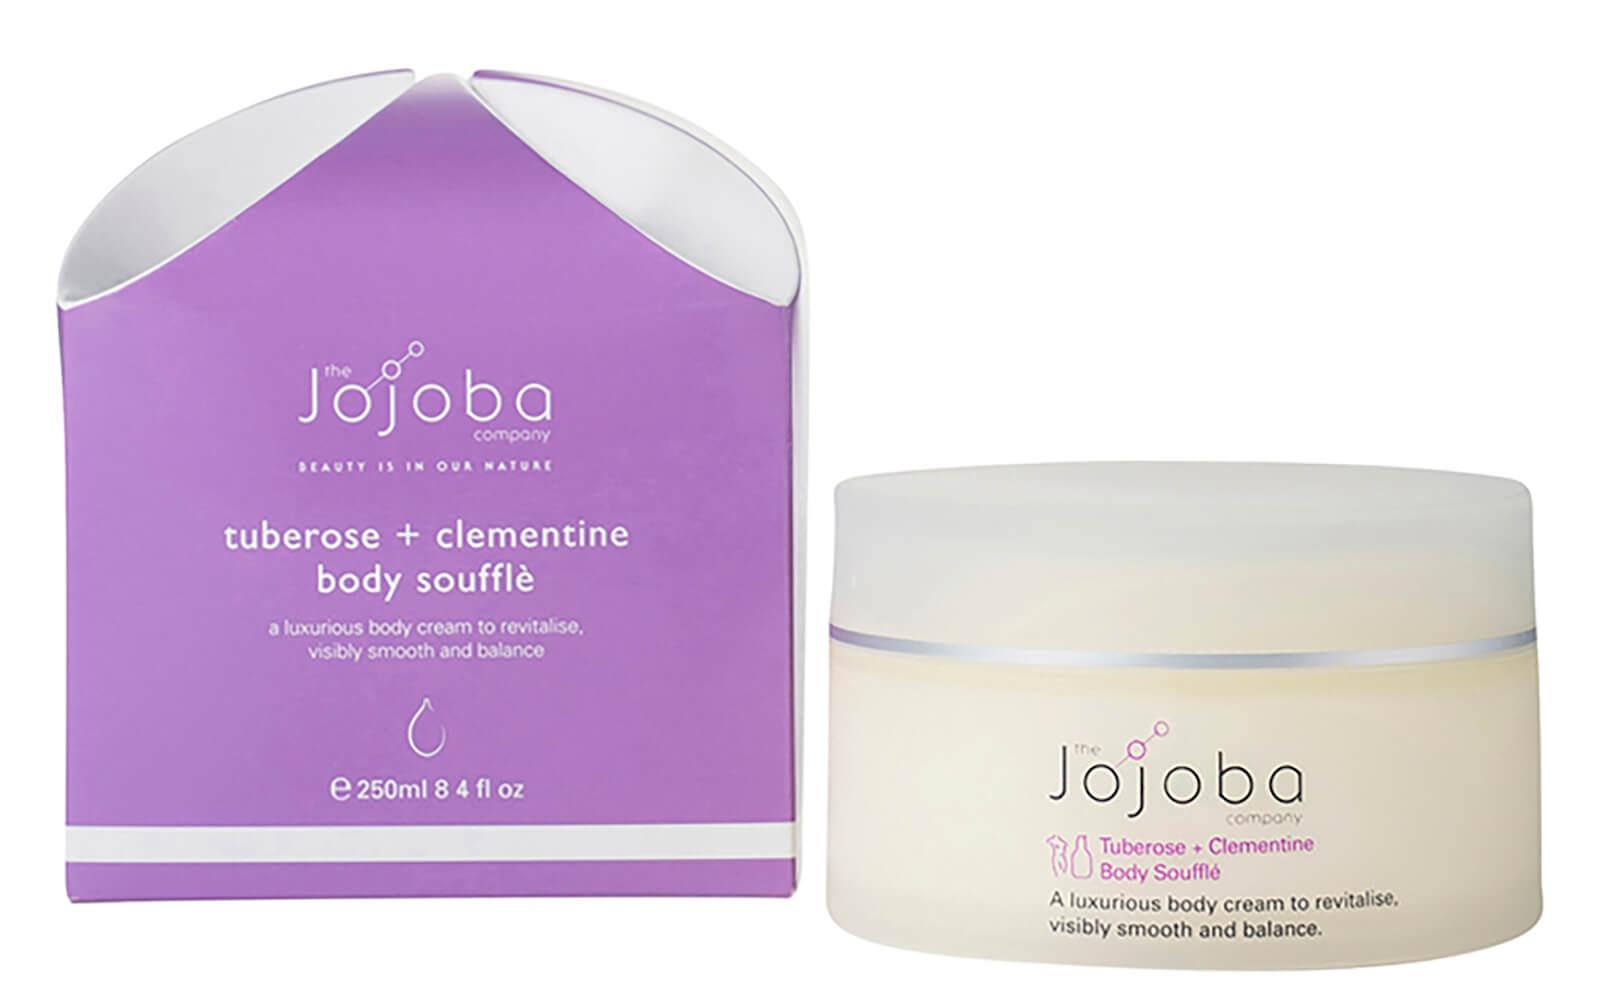 The Jojoba Company Tuberose And Clementine Body Souffle